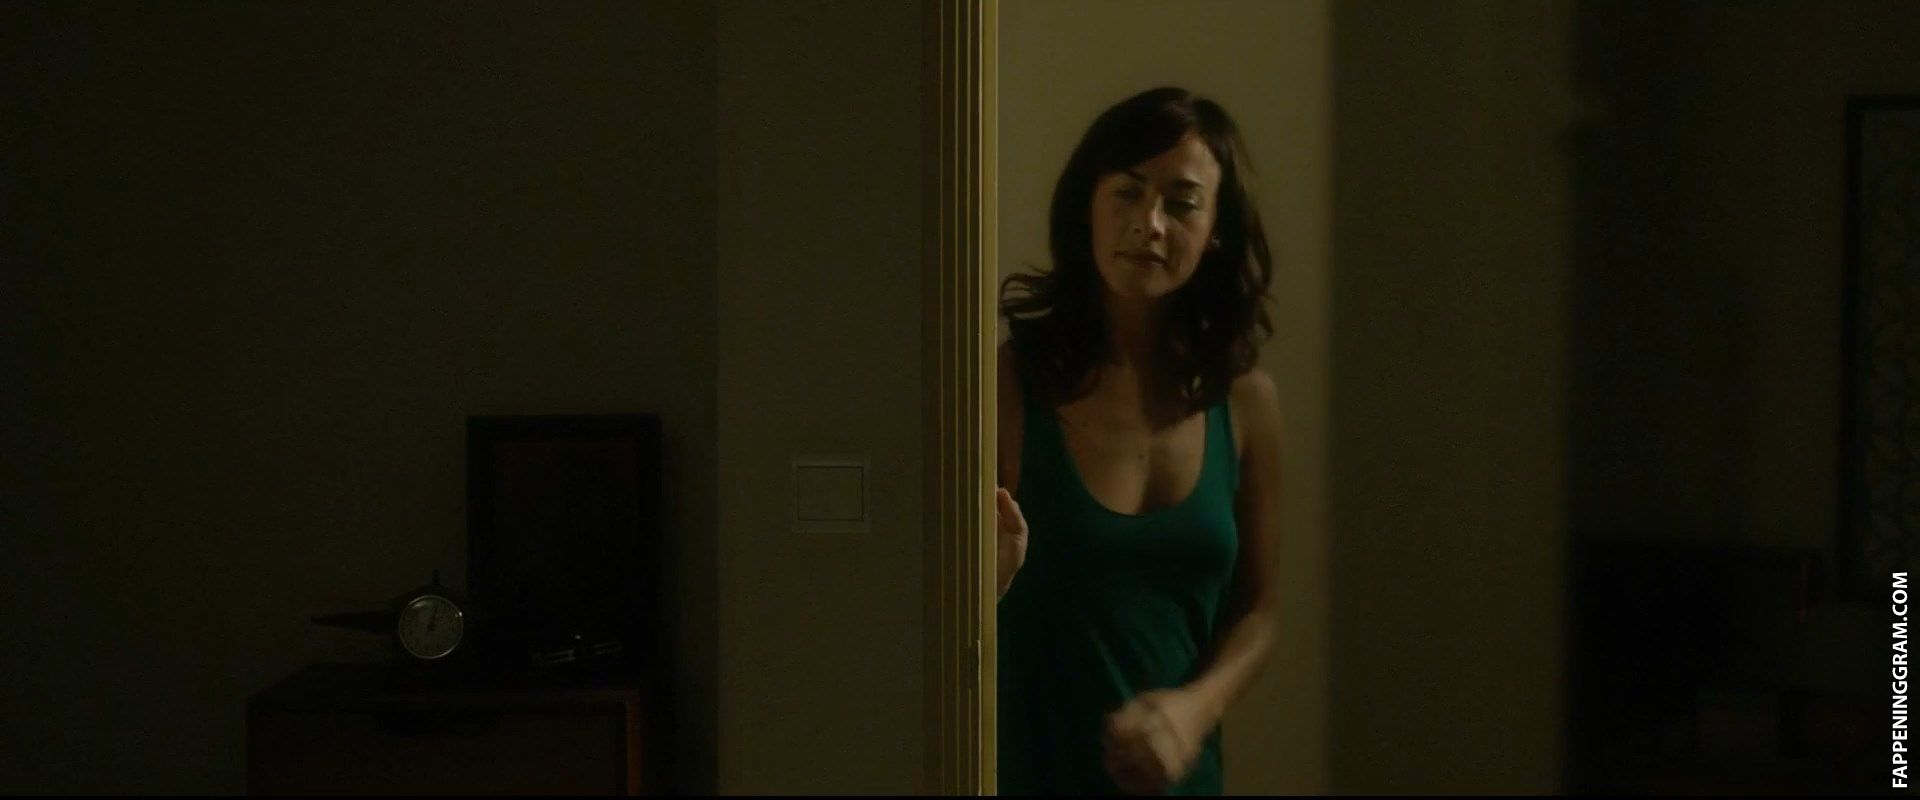 Liautey nackt Vanessa  Teaser dans